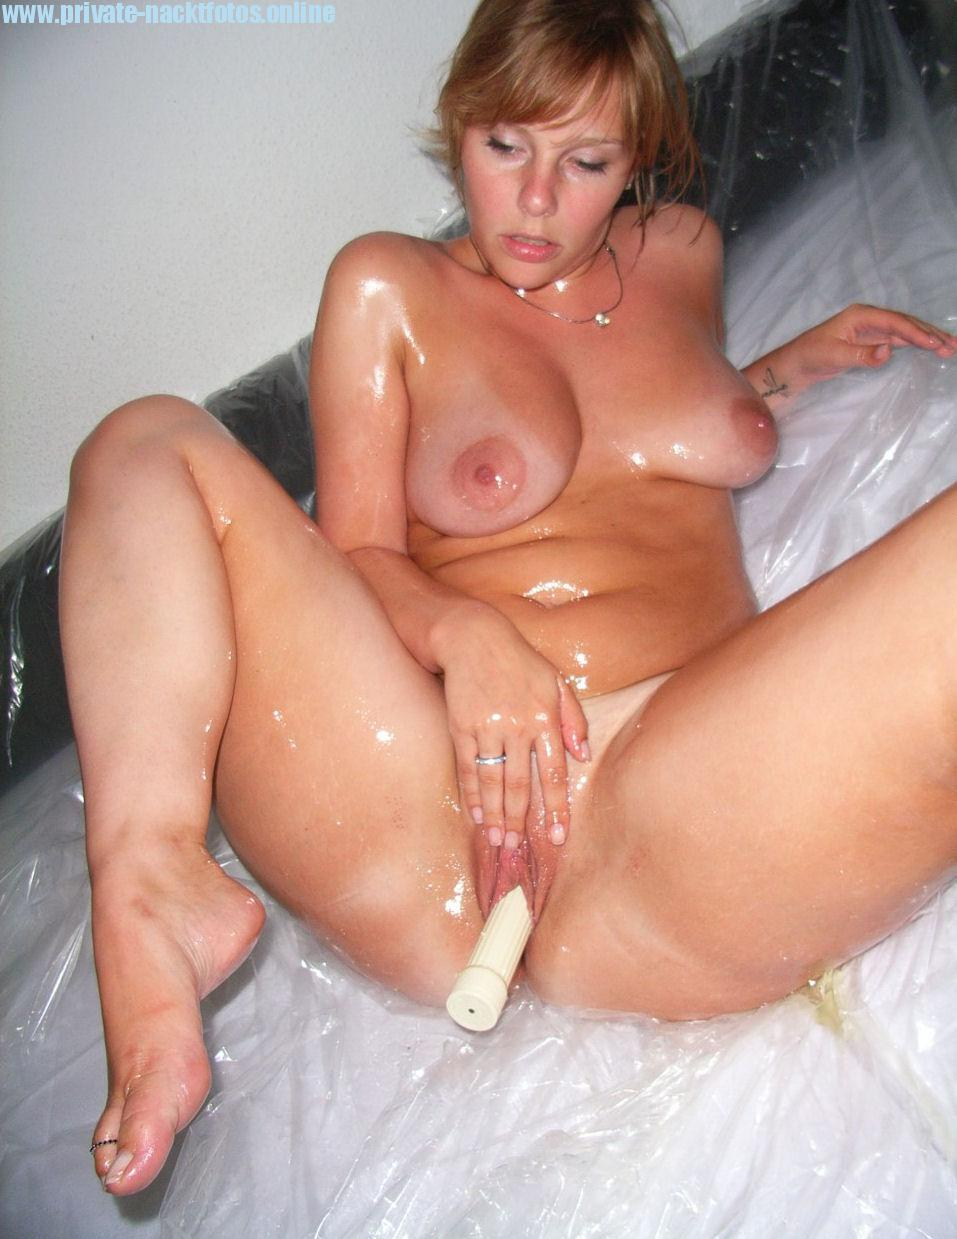 Privater blowjob von dicker hausfrau aus erotik community 1